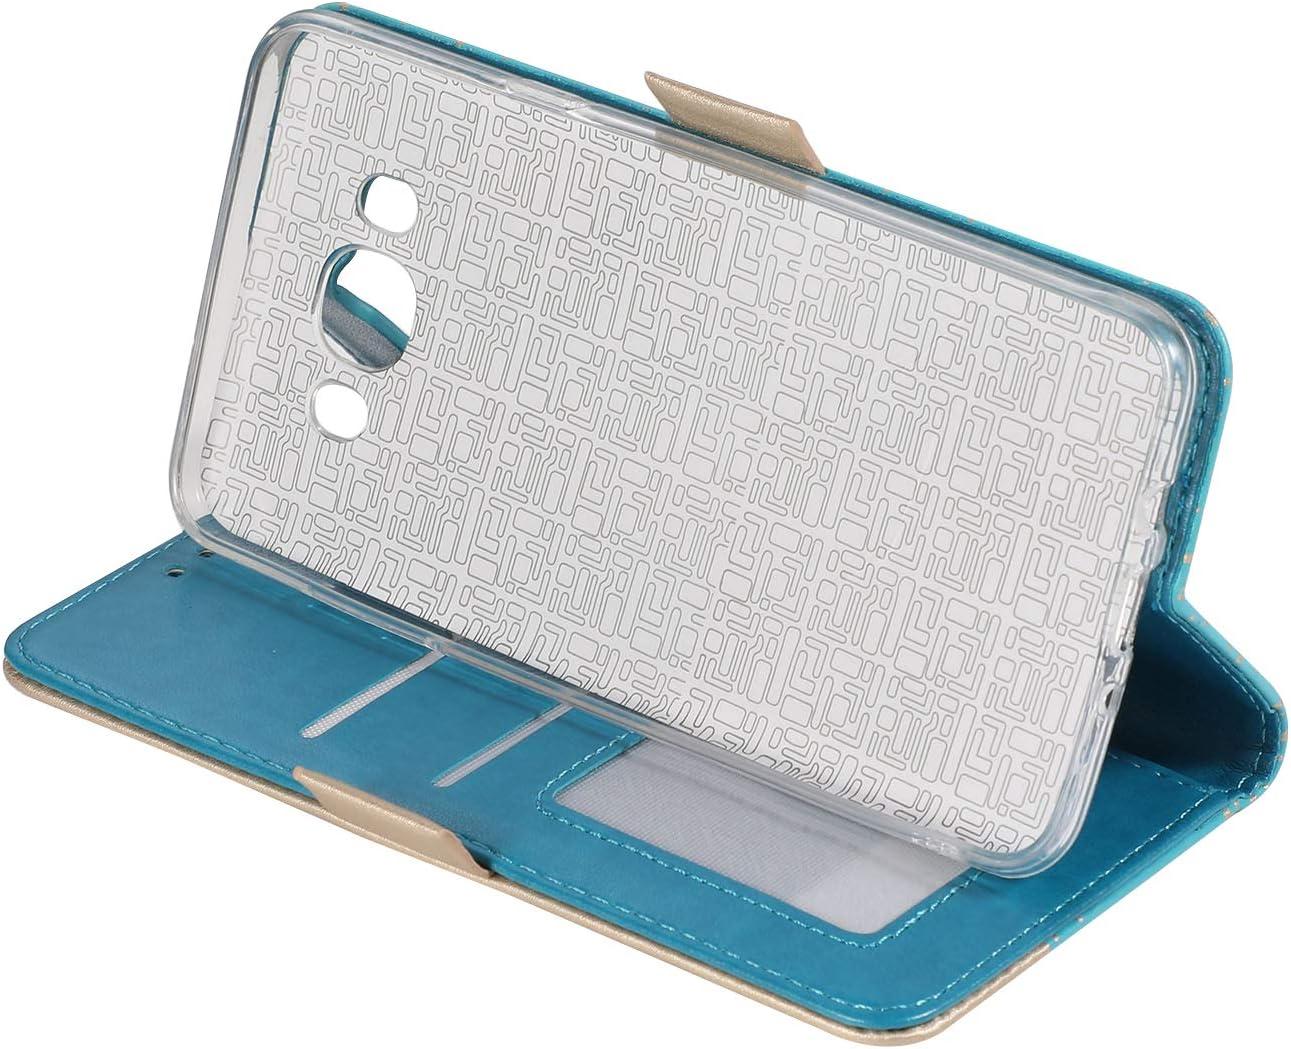 Bowknot Brieftasche Klapph/ülle Kartenf/ächer Wallet Flip Case for Samsung J3 2017 Handytasche Standfunktion-Schwarz Huphant Compatible for Handyh/ülle Samsung Galaxy J3 2017 h/ülle Leder N/ähte Farbe